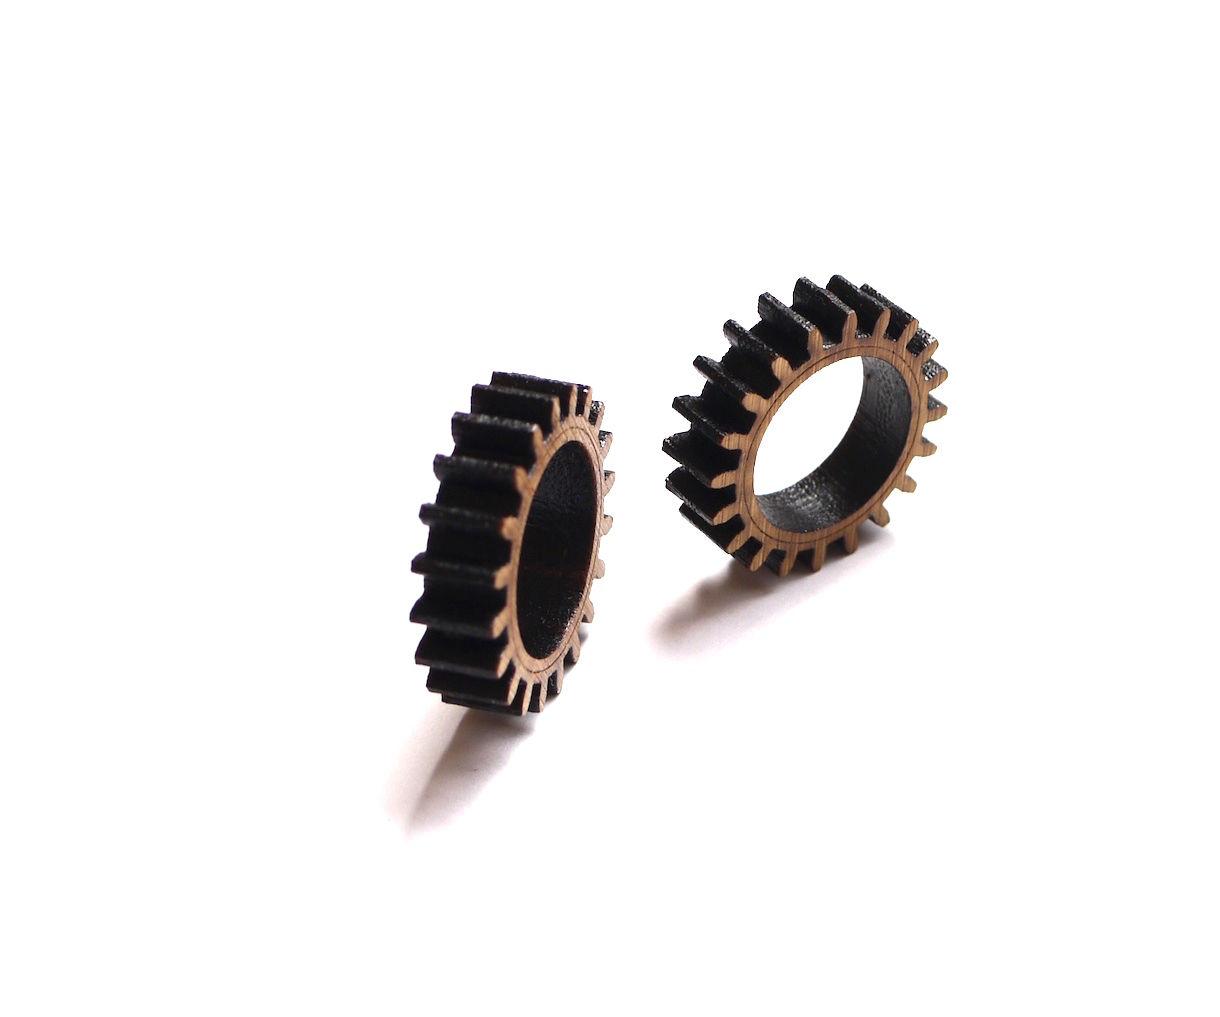 Make Your Own Fidget Rings - DIY Wood Gear Rings